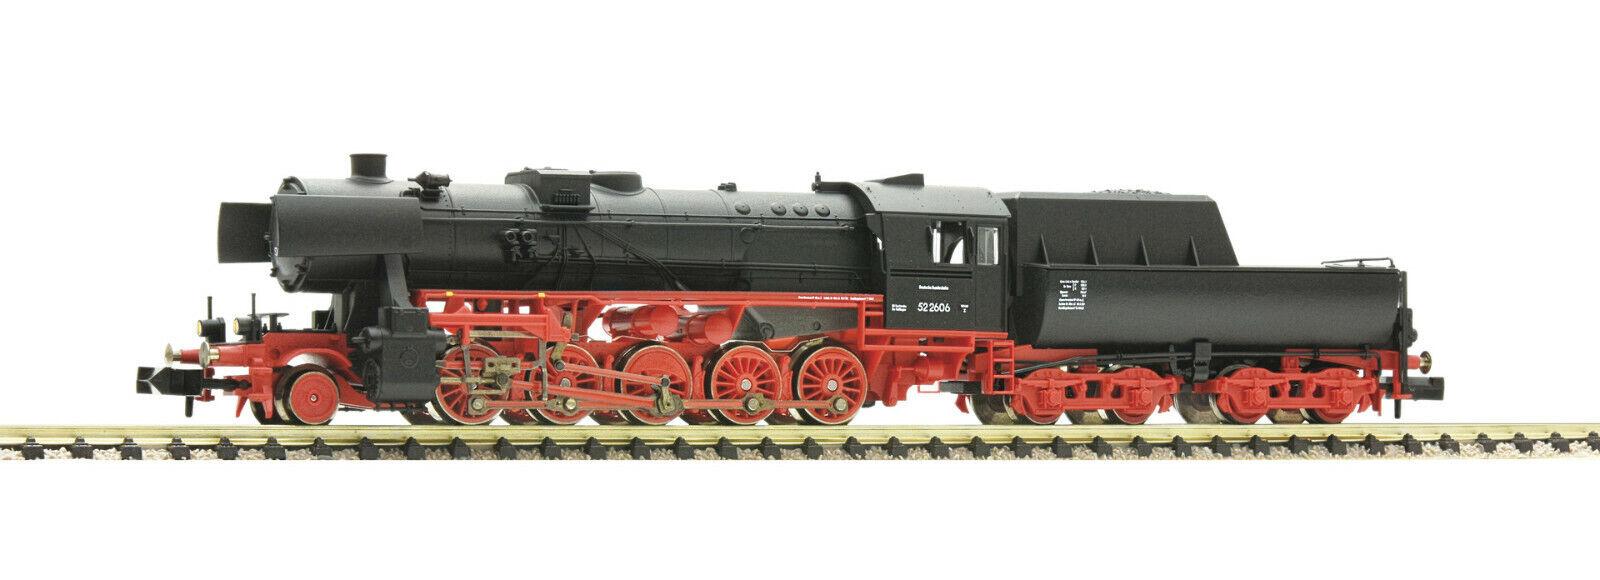 Fleischmann n 715213-locomotora a vapor br 52, DB mercancía nueva